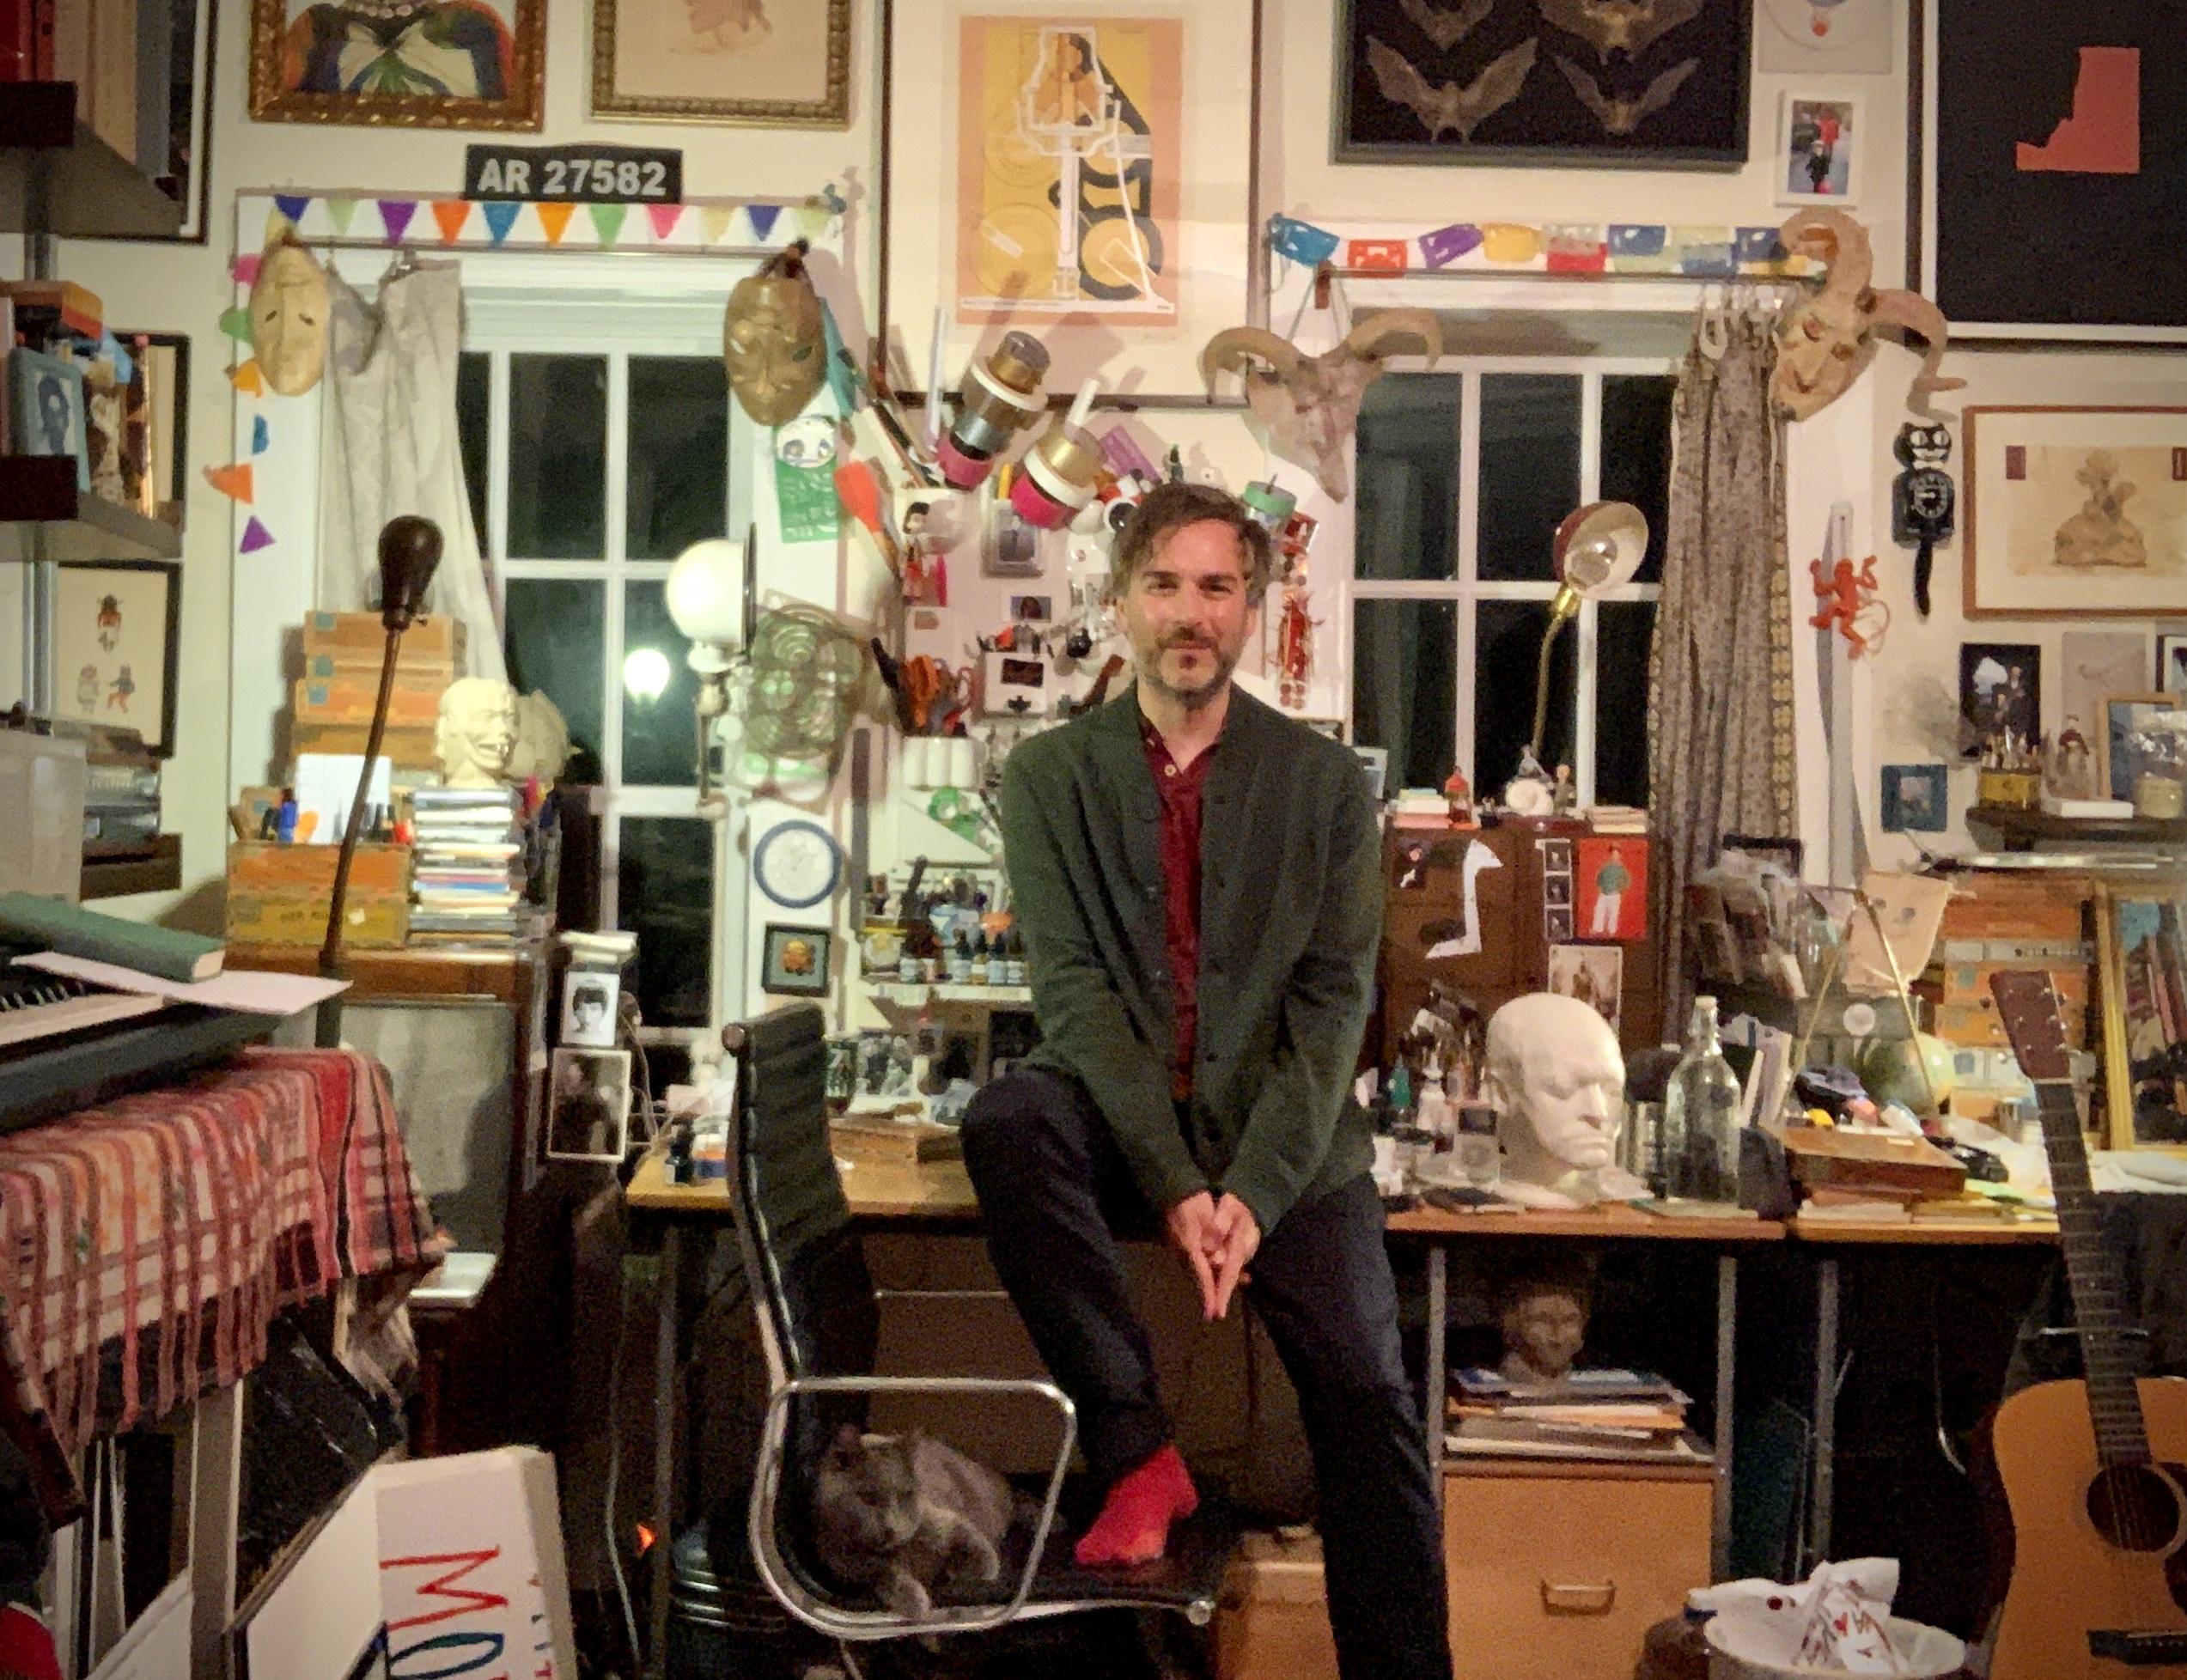 Portrait of Marcel Dzama, 2020 Courtesy the artist and David Zwirner